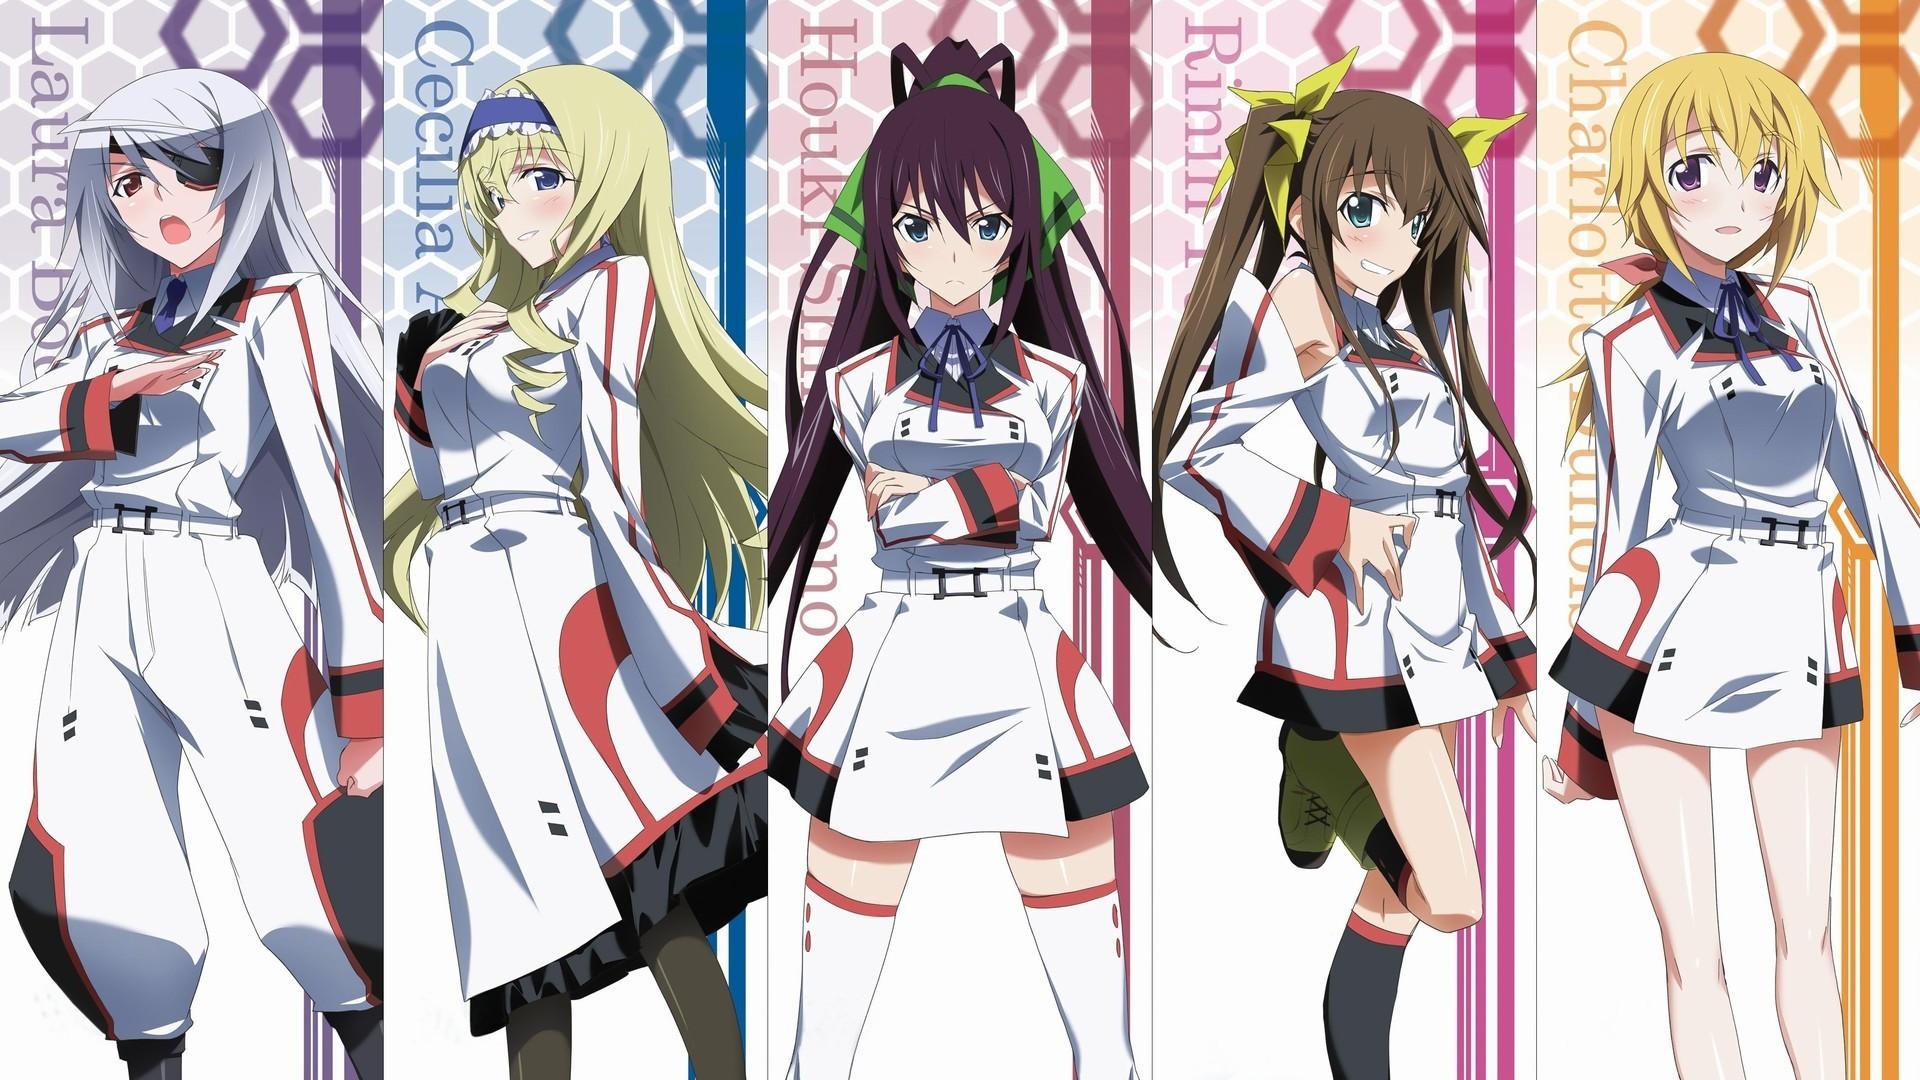 Res: 1920x1080, otaku anime wallpaper #693290